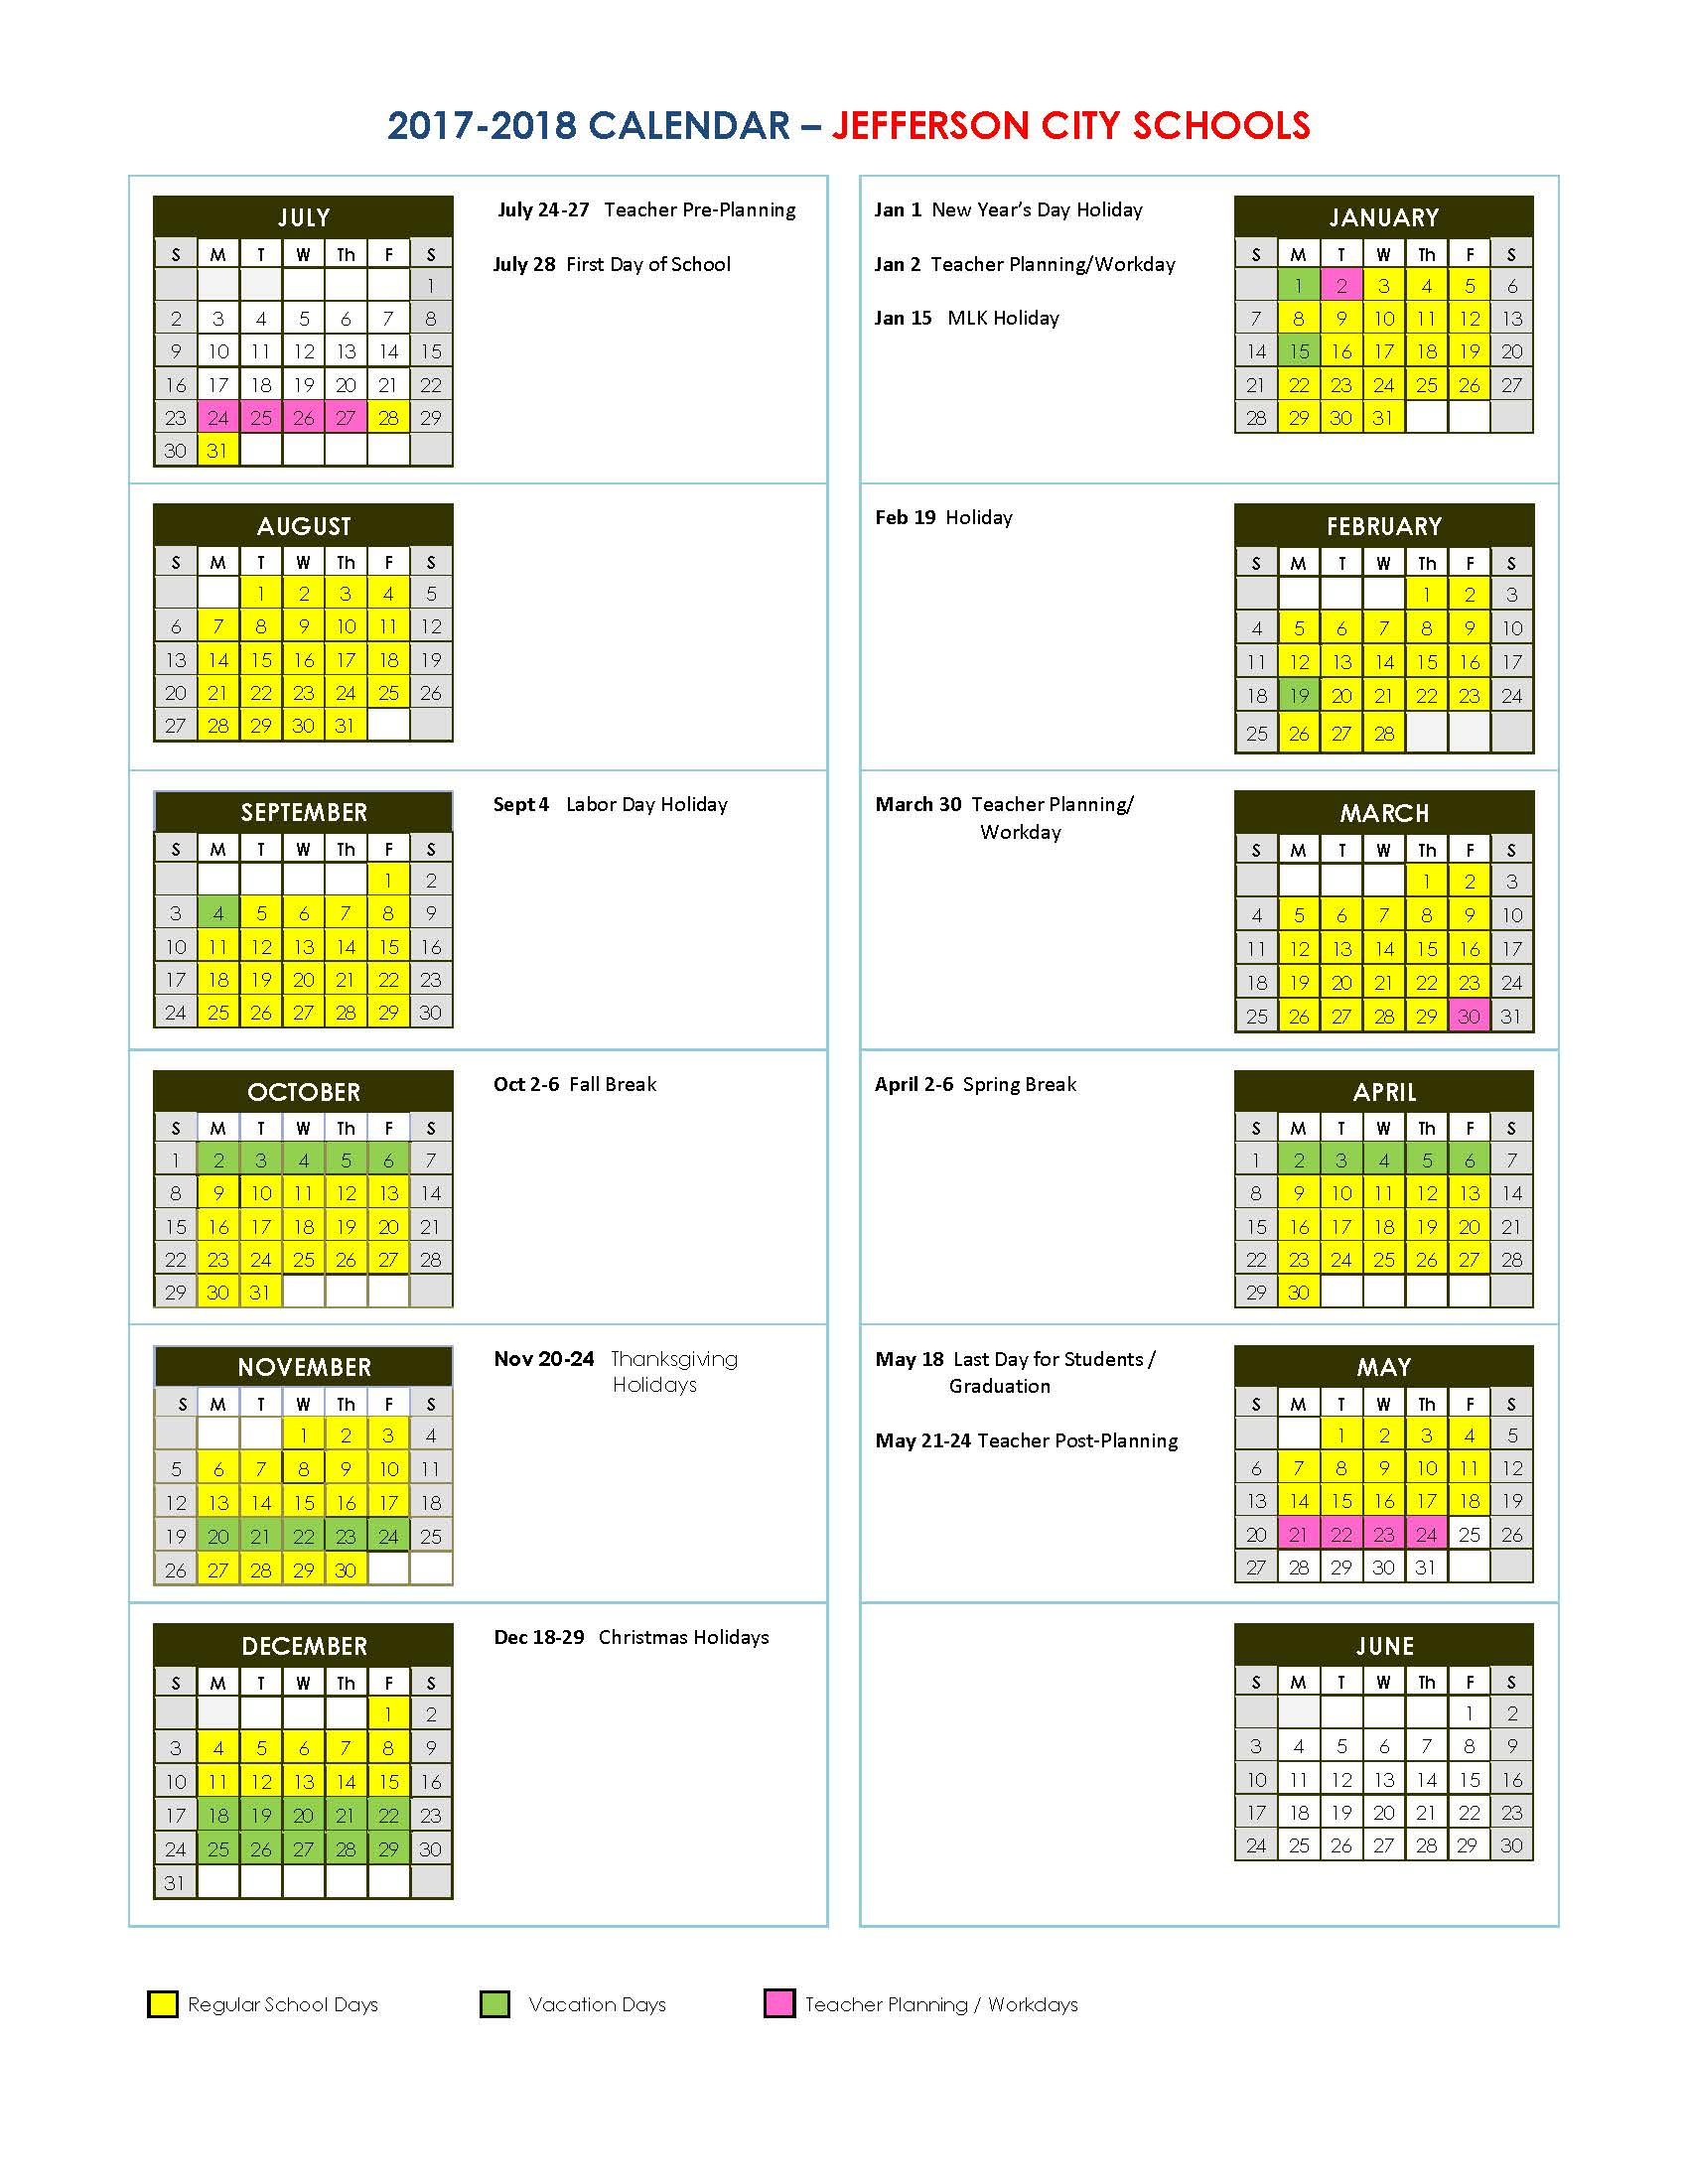 Jefferson City Schools With Ga State University Calendar 2021